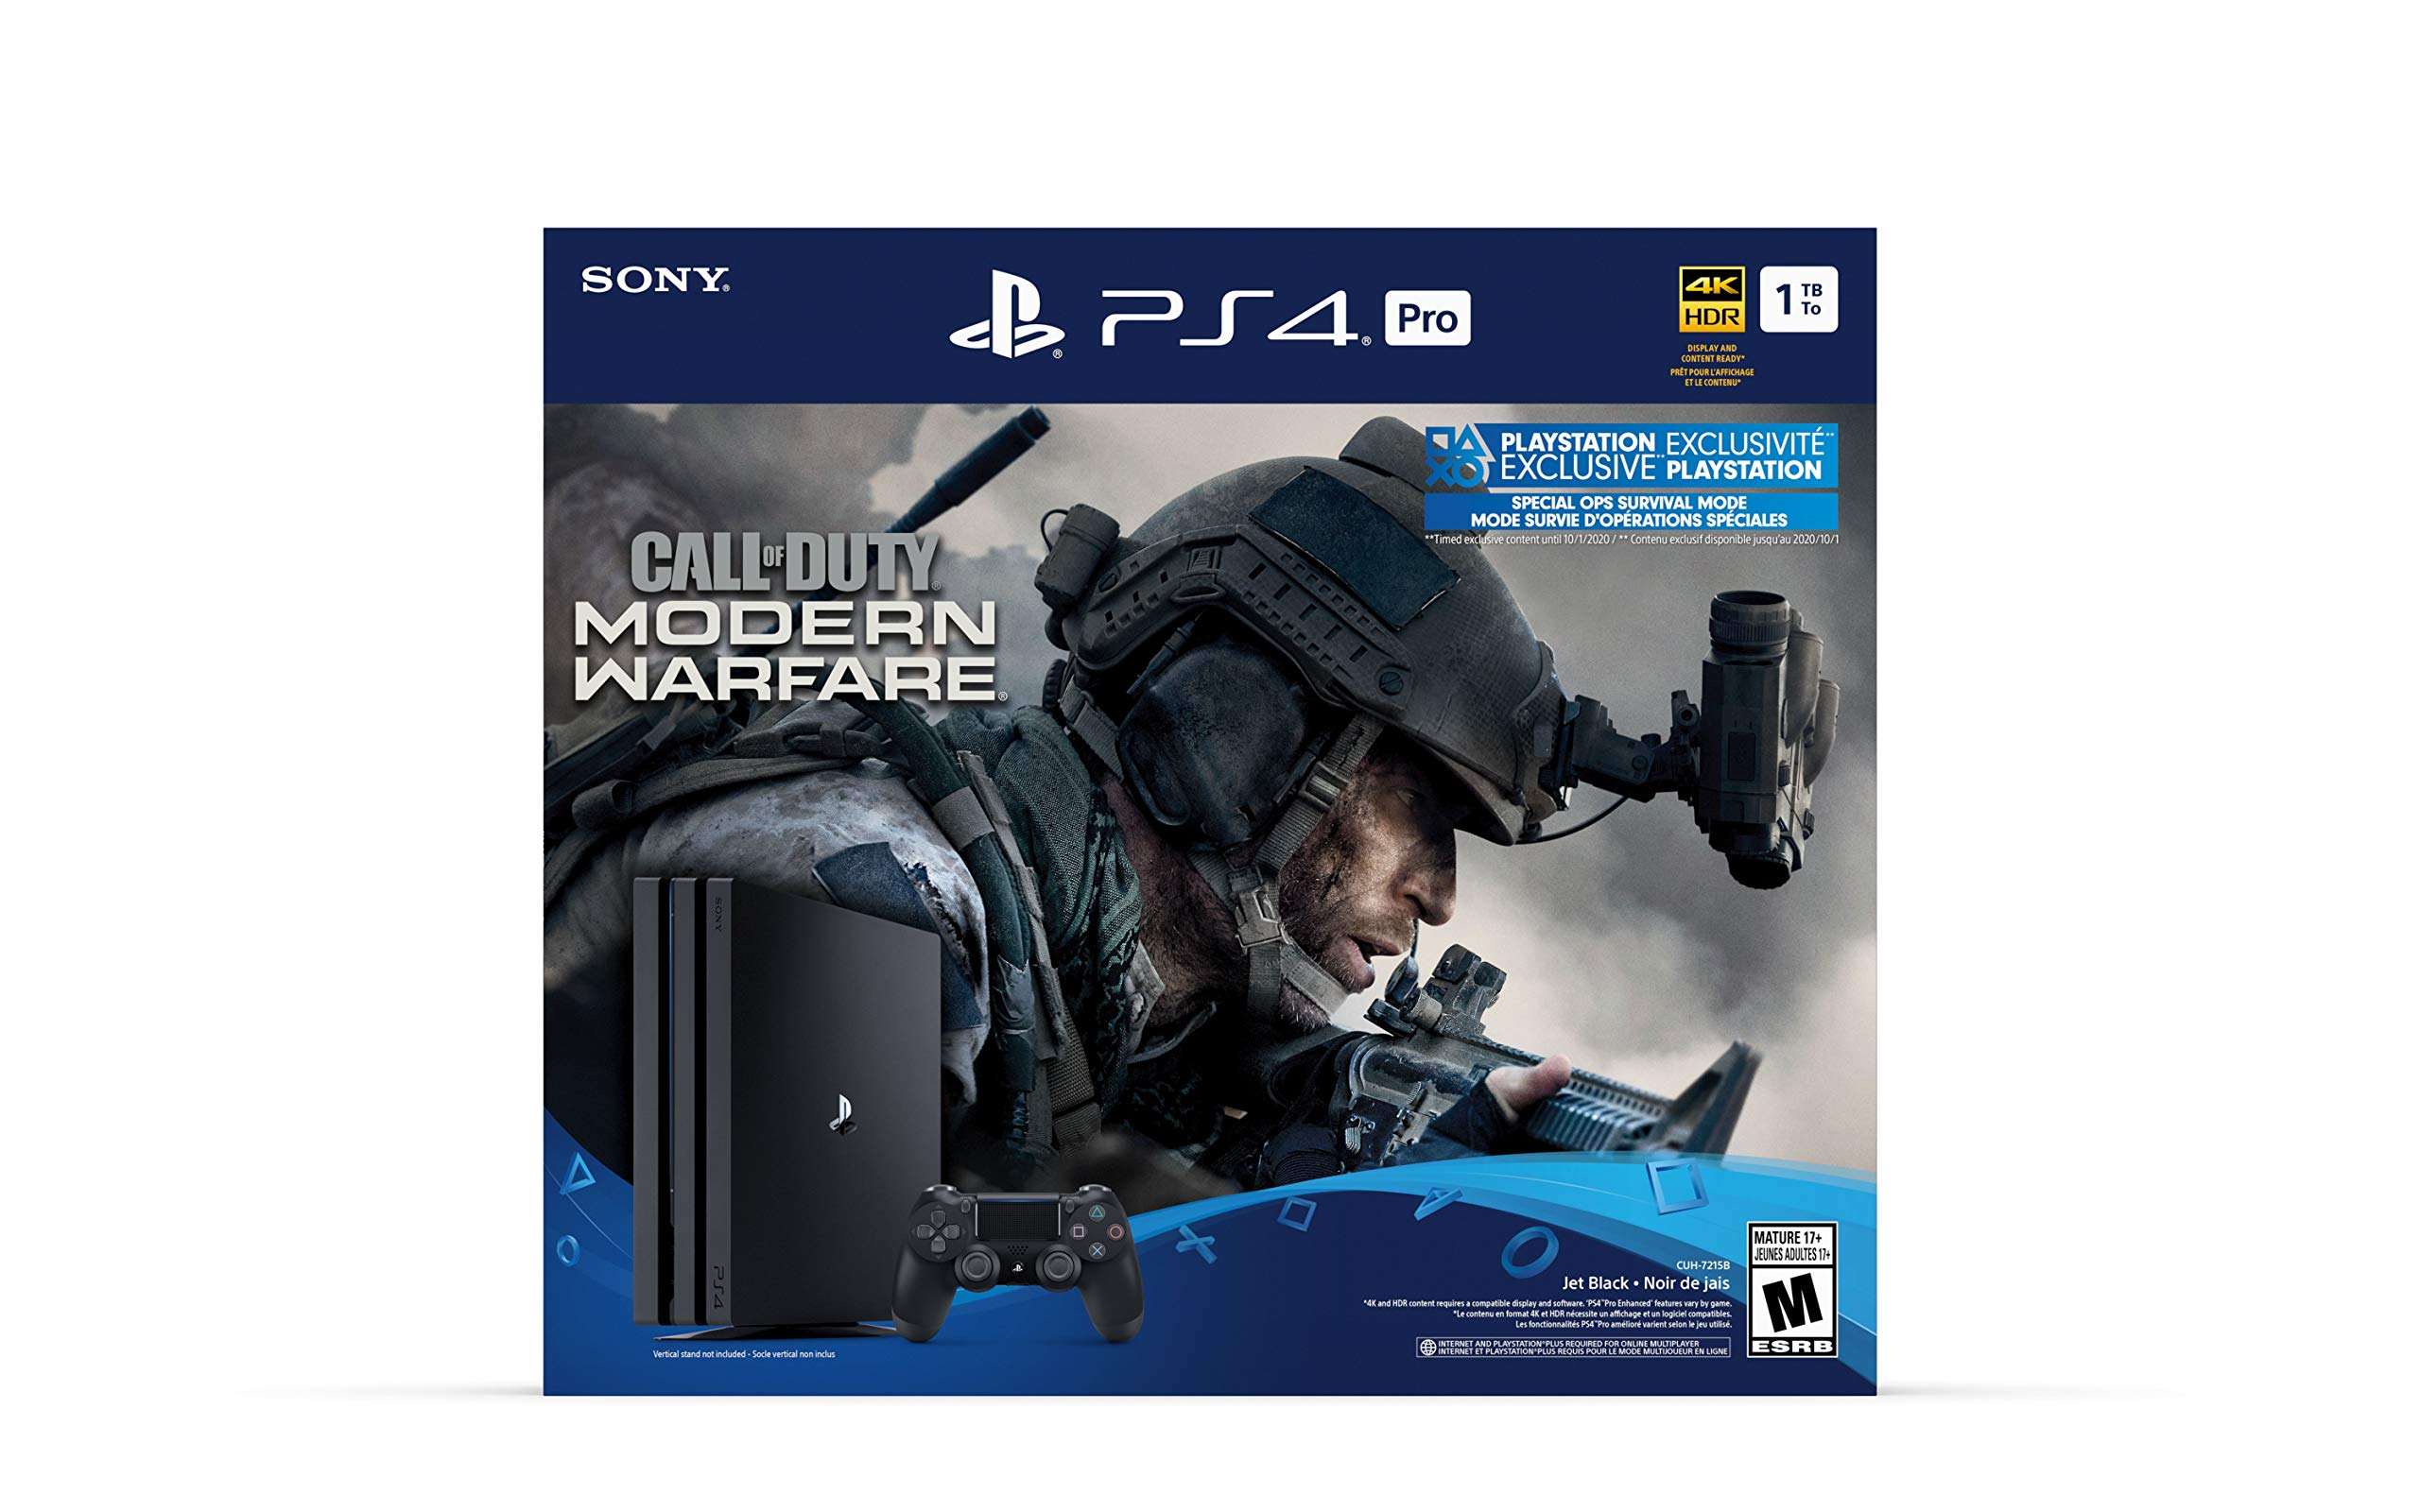 Consola PlayStation 4 Pro de 1 TB - Paquete de Call of Duty: Modern Warfare